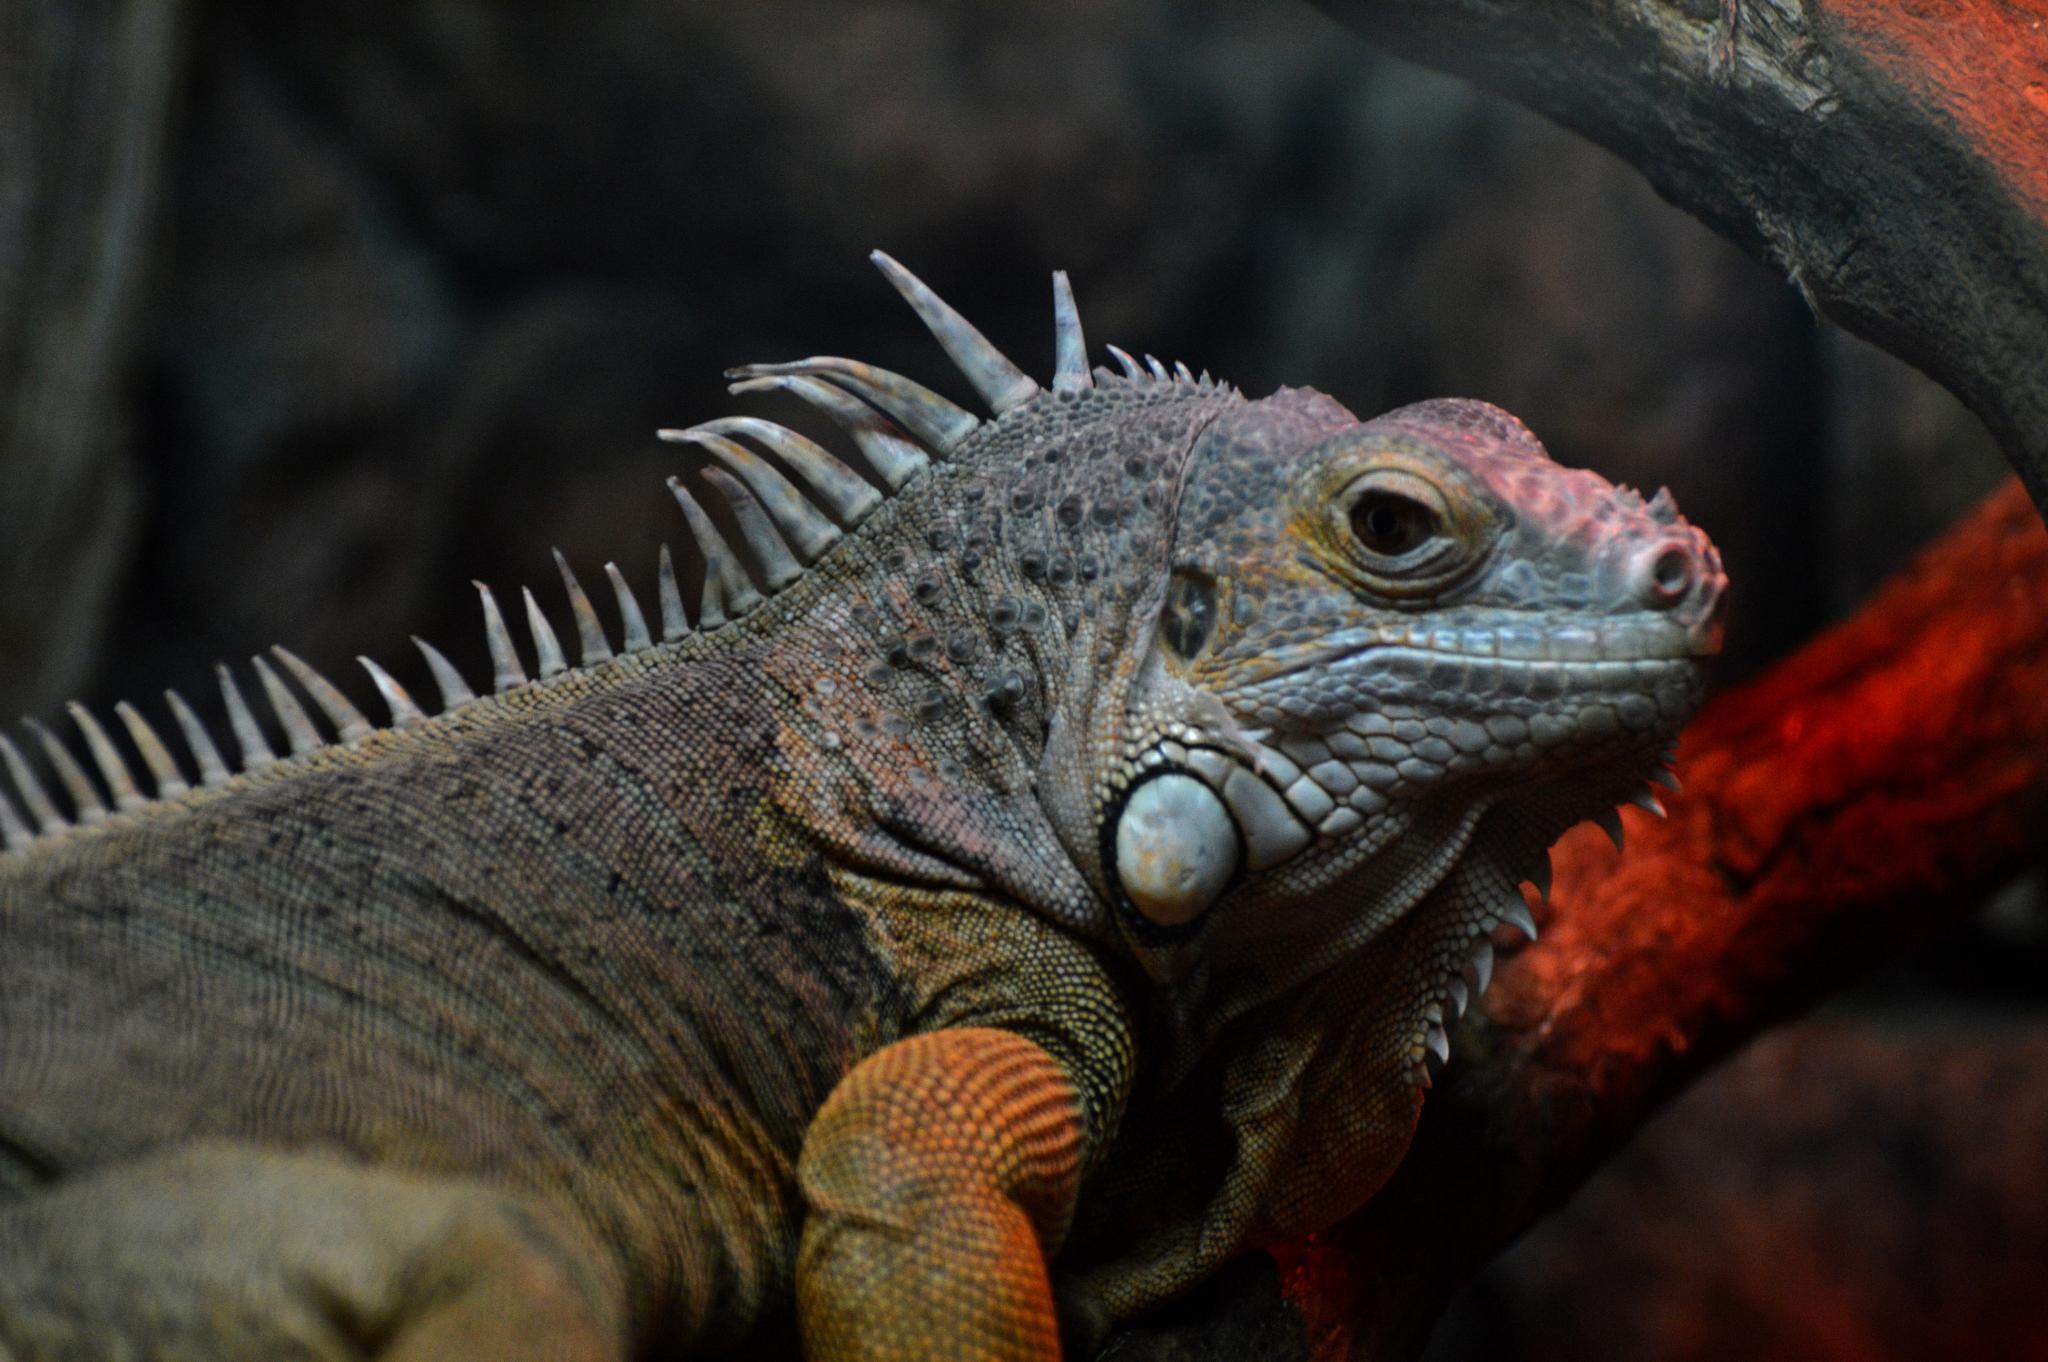 iguana by Hermine Makaryan